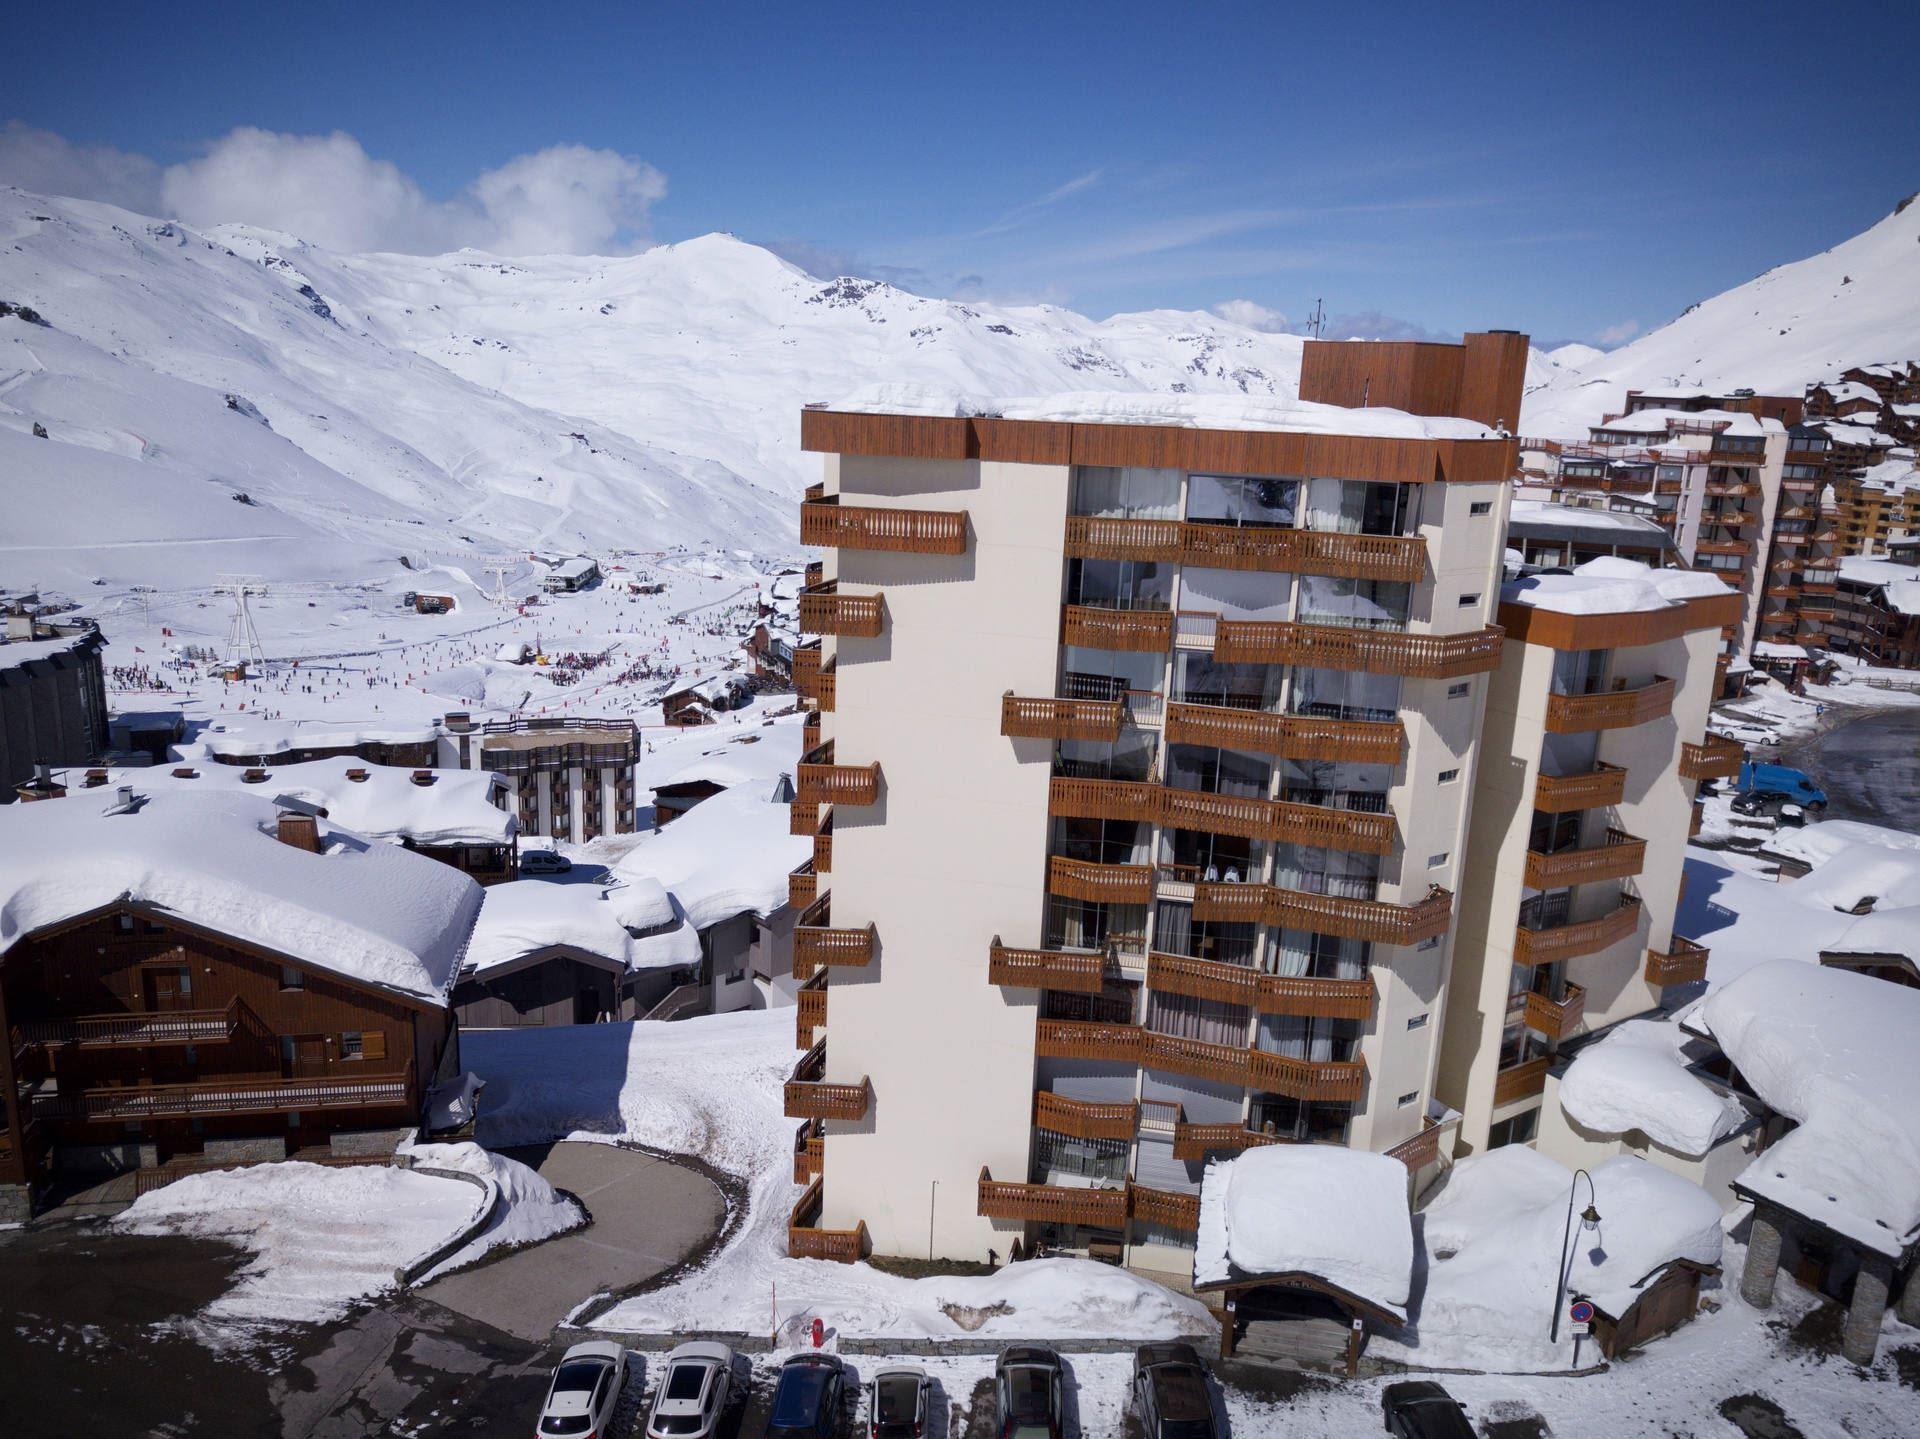 DOME DE POLSET 303 / STUDIO 3 PERSONS - 1 BRONZE SNOWFLAKE - VTI